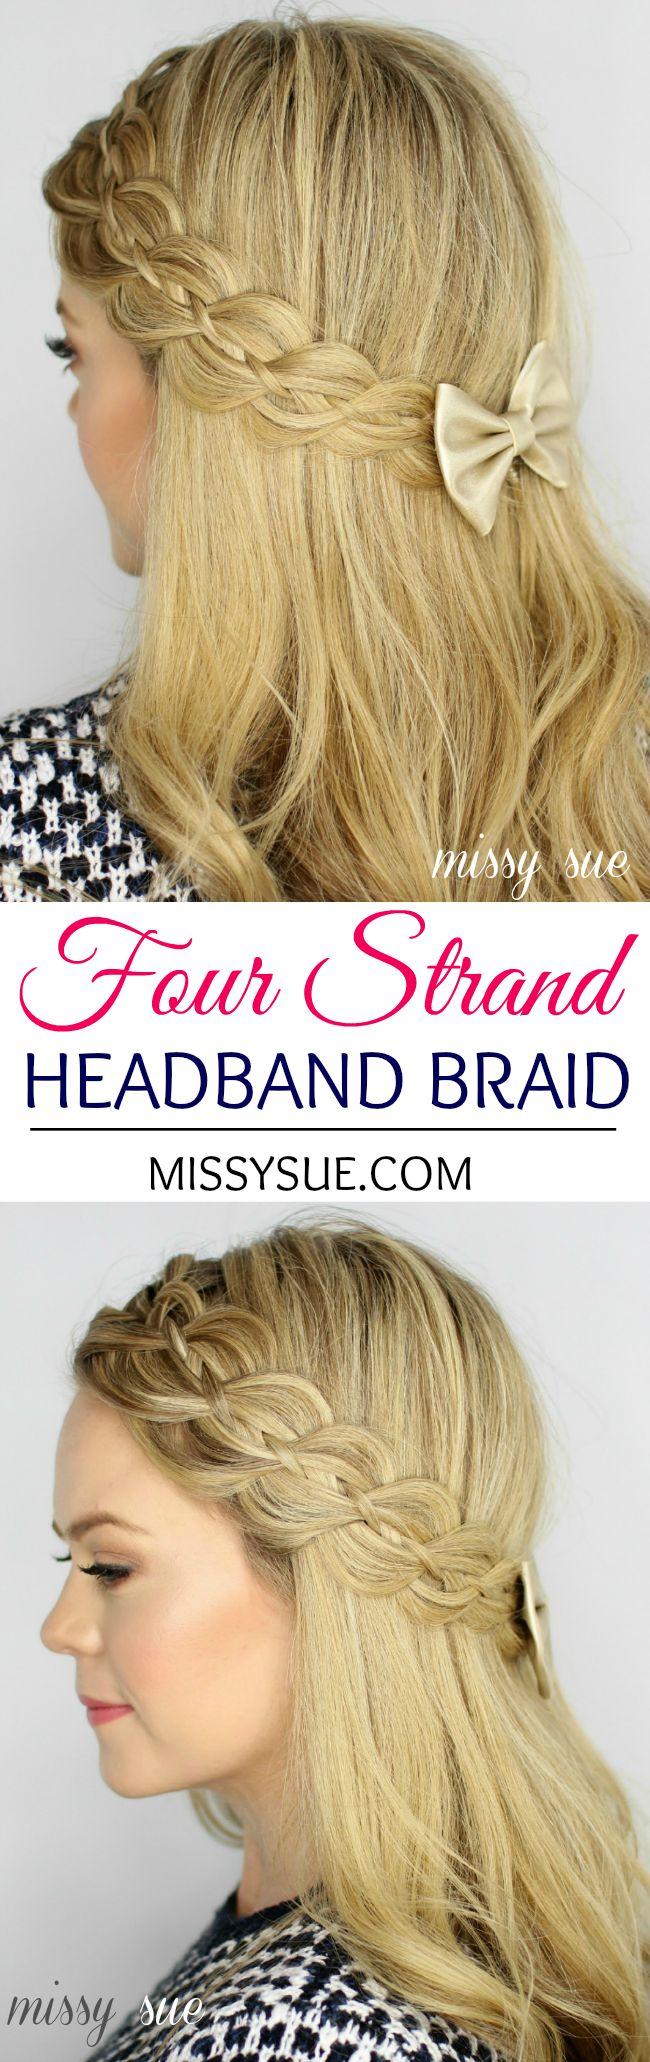 Four Strand Headband Braid, SO pretty!